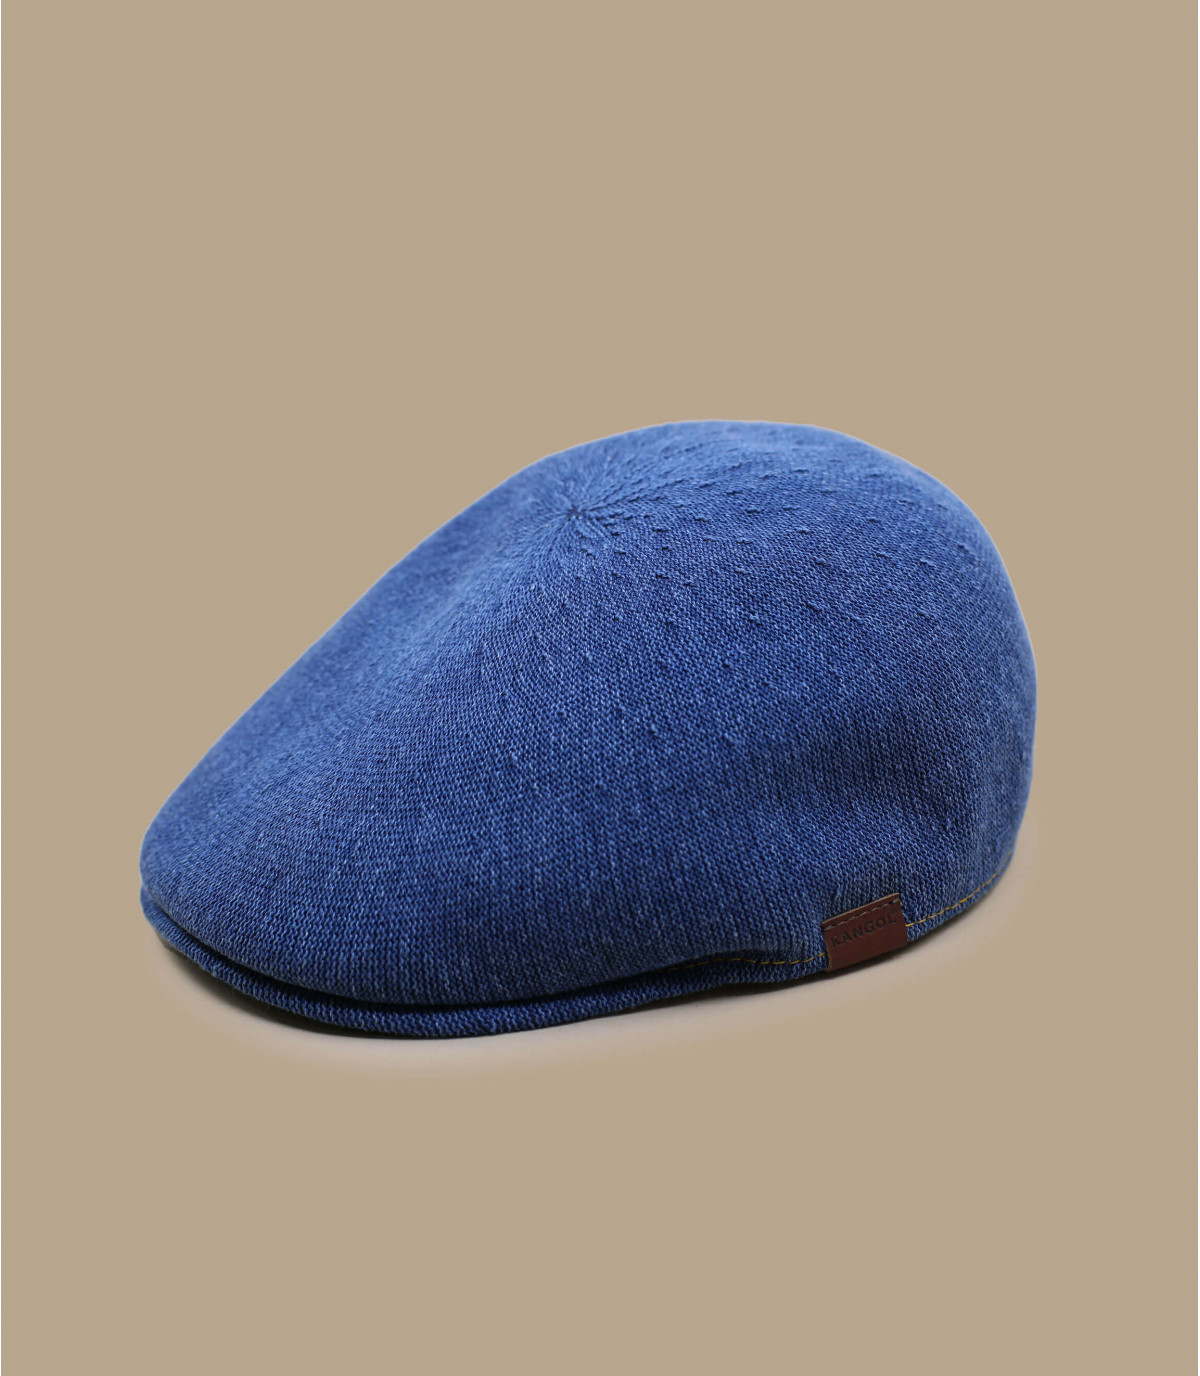 Détails Denim 507 indigo wash - image 2